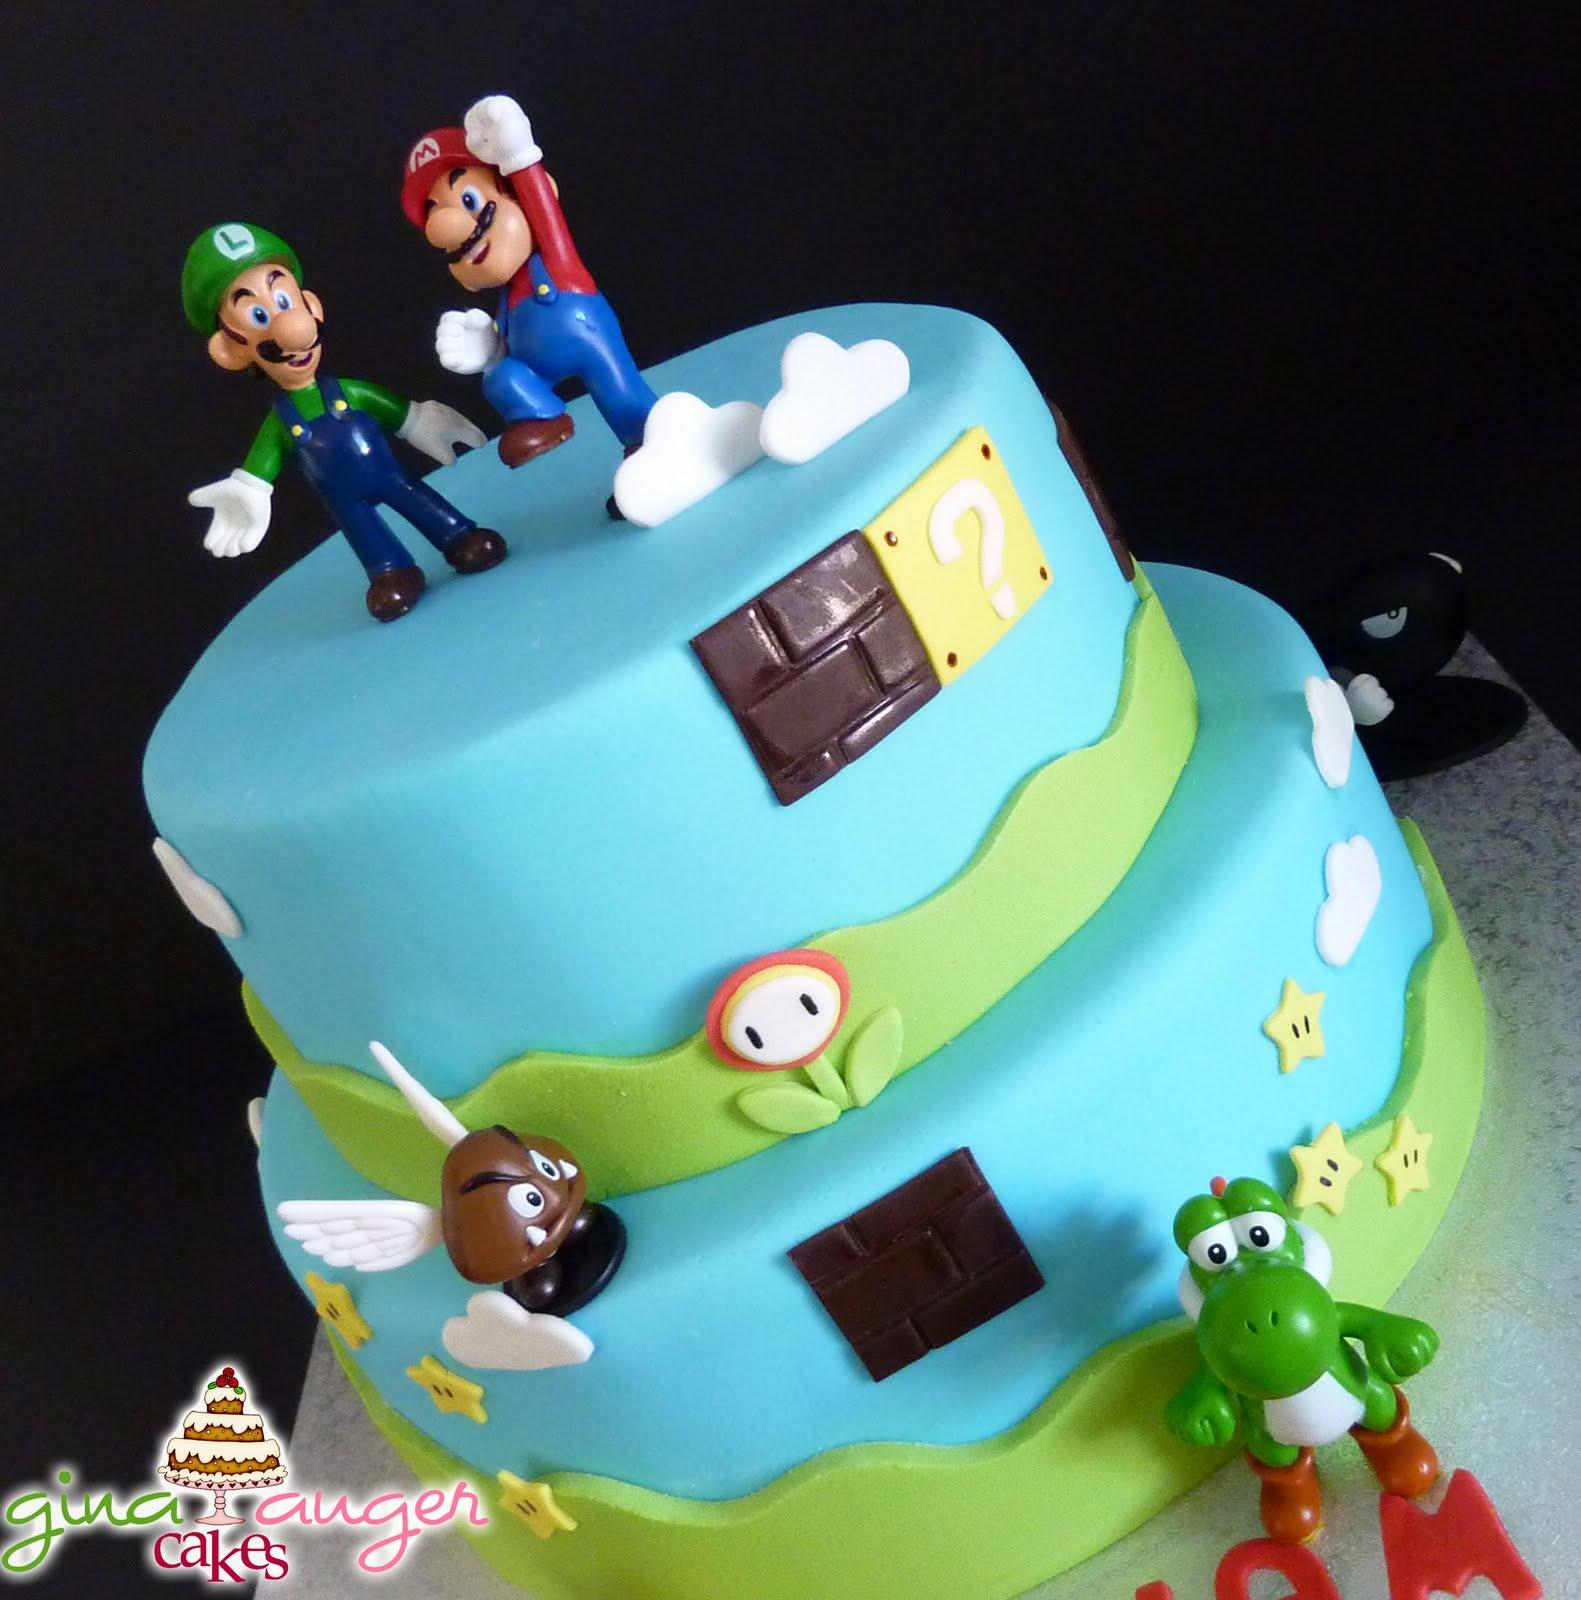 Top That Mario Bros Cake  Williams Th Birthday - 5th birthday cake boy